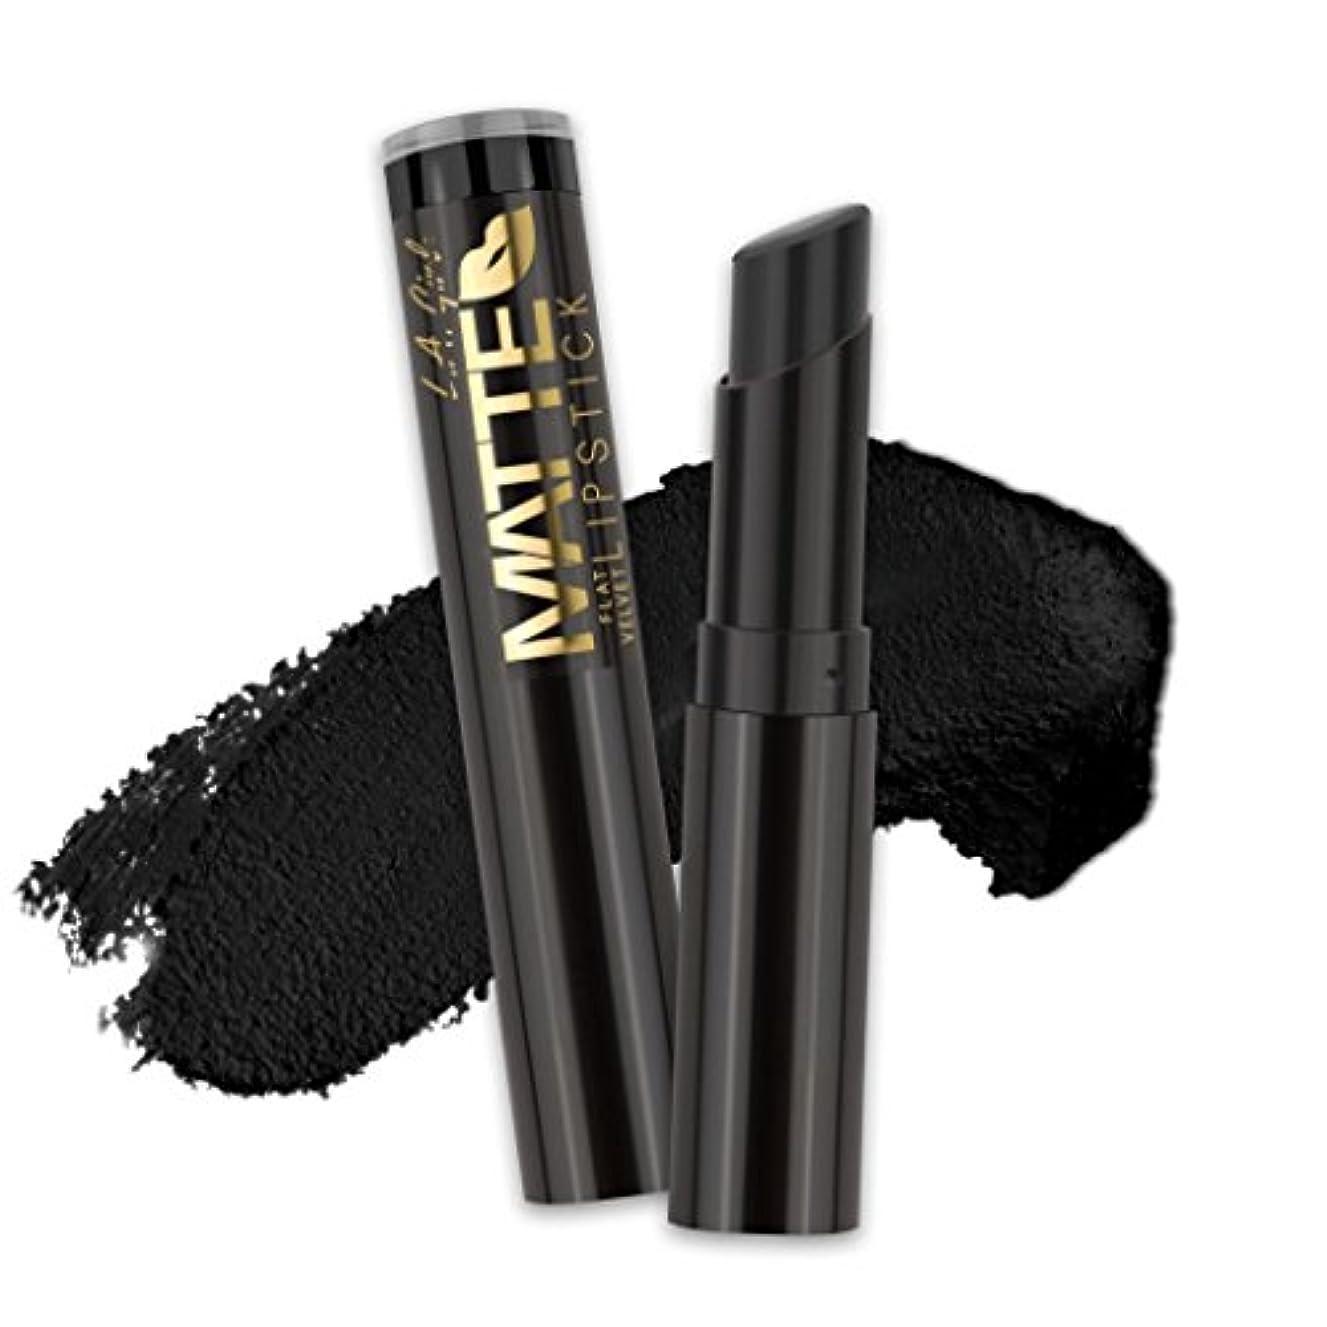 管理者聖域ブランチ(3 Pack) L.A. GIRL Matte Flat Velvet Lipstick - Raven (並行輸入品)